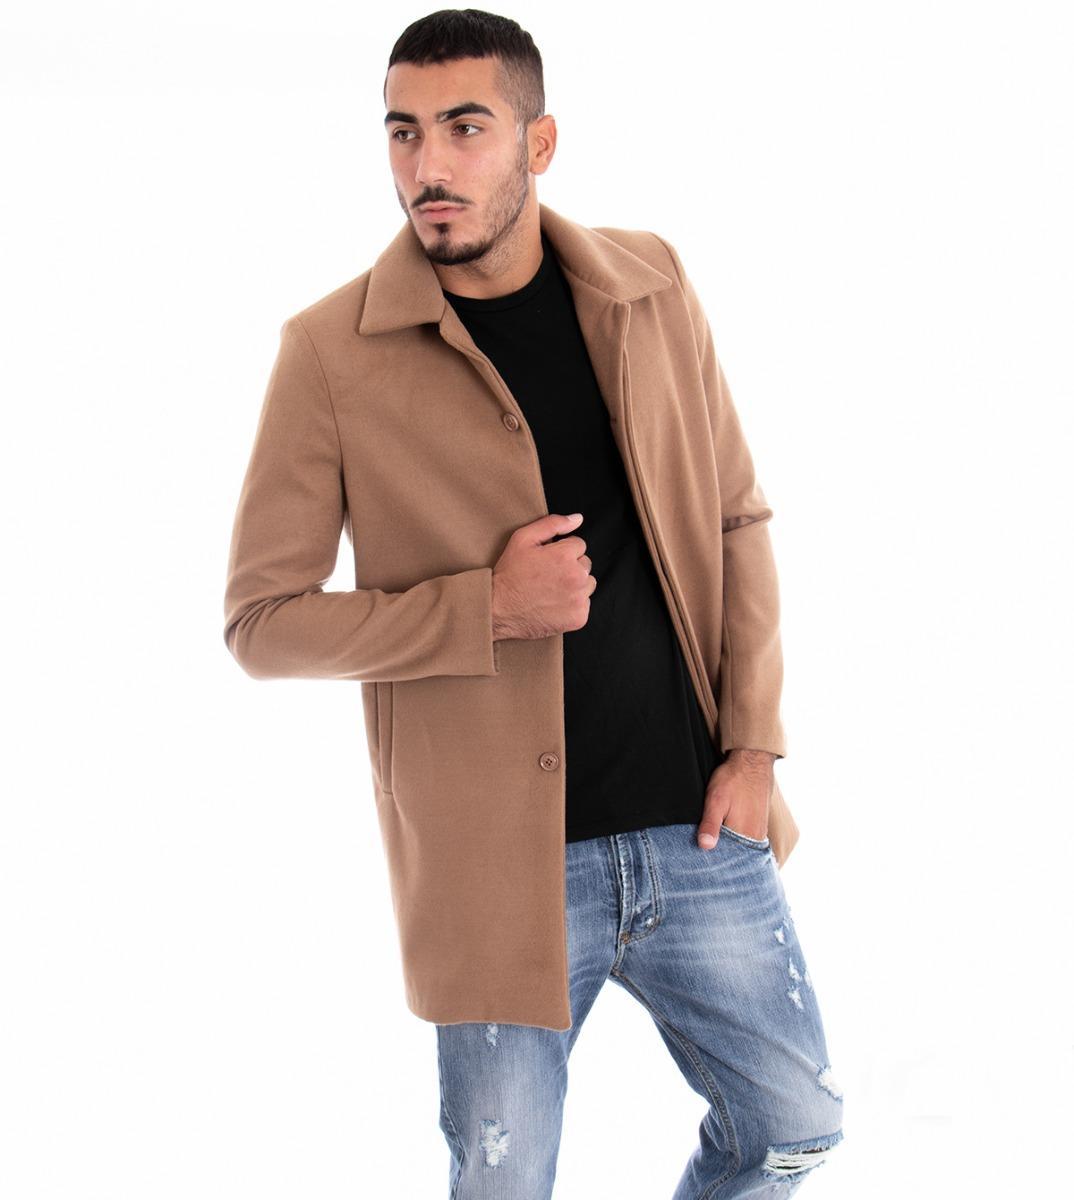 Giacca Uomo Elegante Lunga Giubbotto Colletto Tinta Unita Camel Slim Giosal Brillant